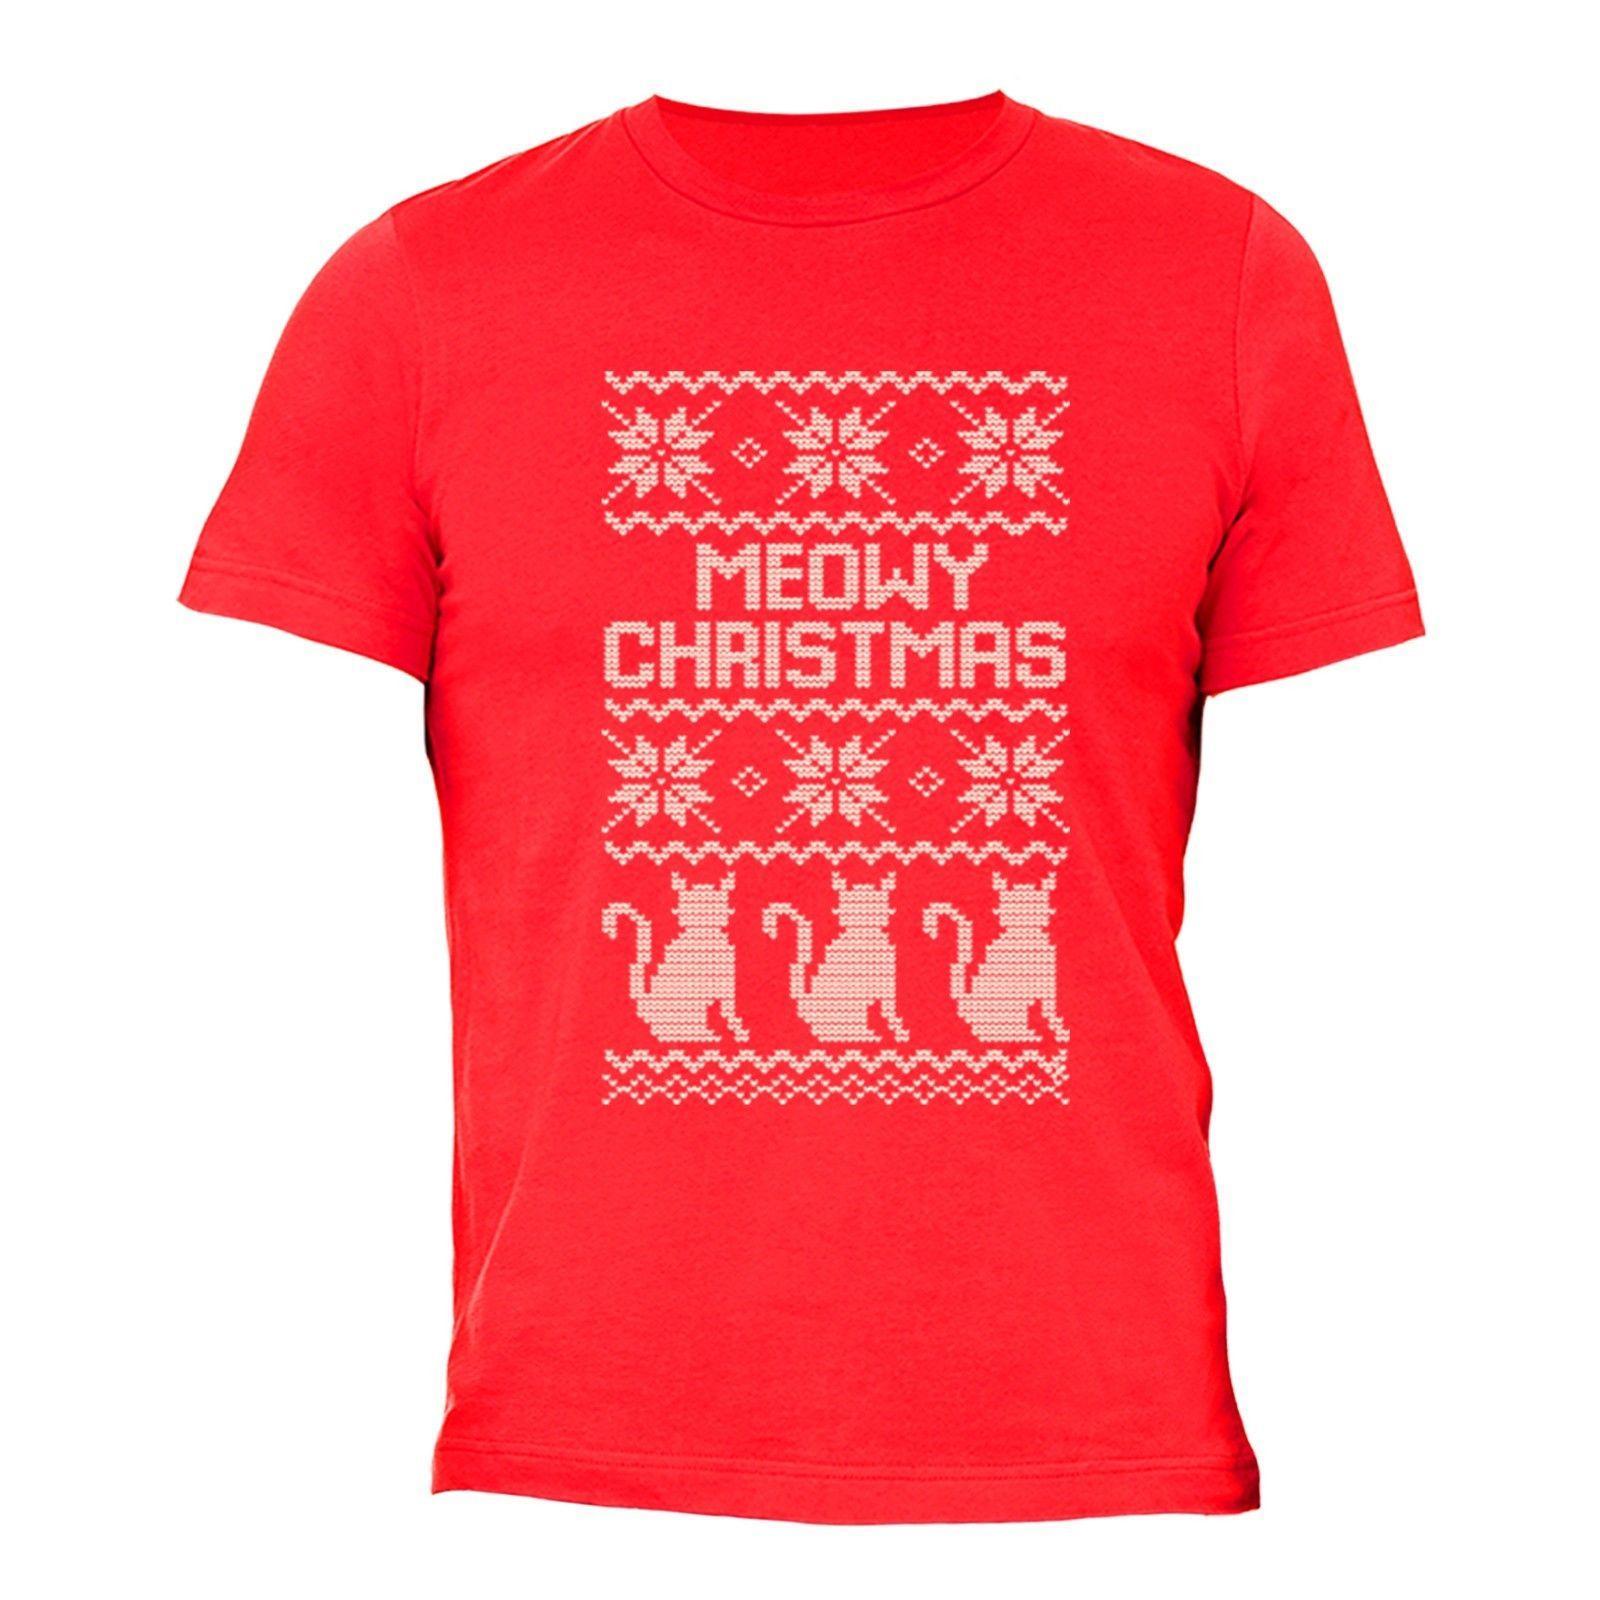 Meowy Christmas Sweater.Mens Meowy Christmas Cat Kitten Animal Ugly Christmas Sweater Santa T Shirt Red Jersey Print T Shirt Brand Shirts Jeans Print